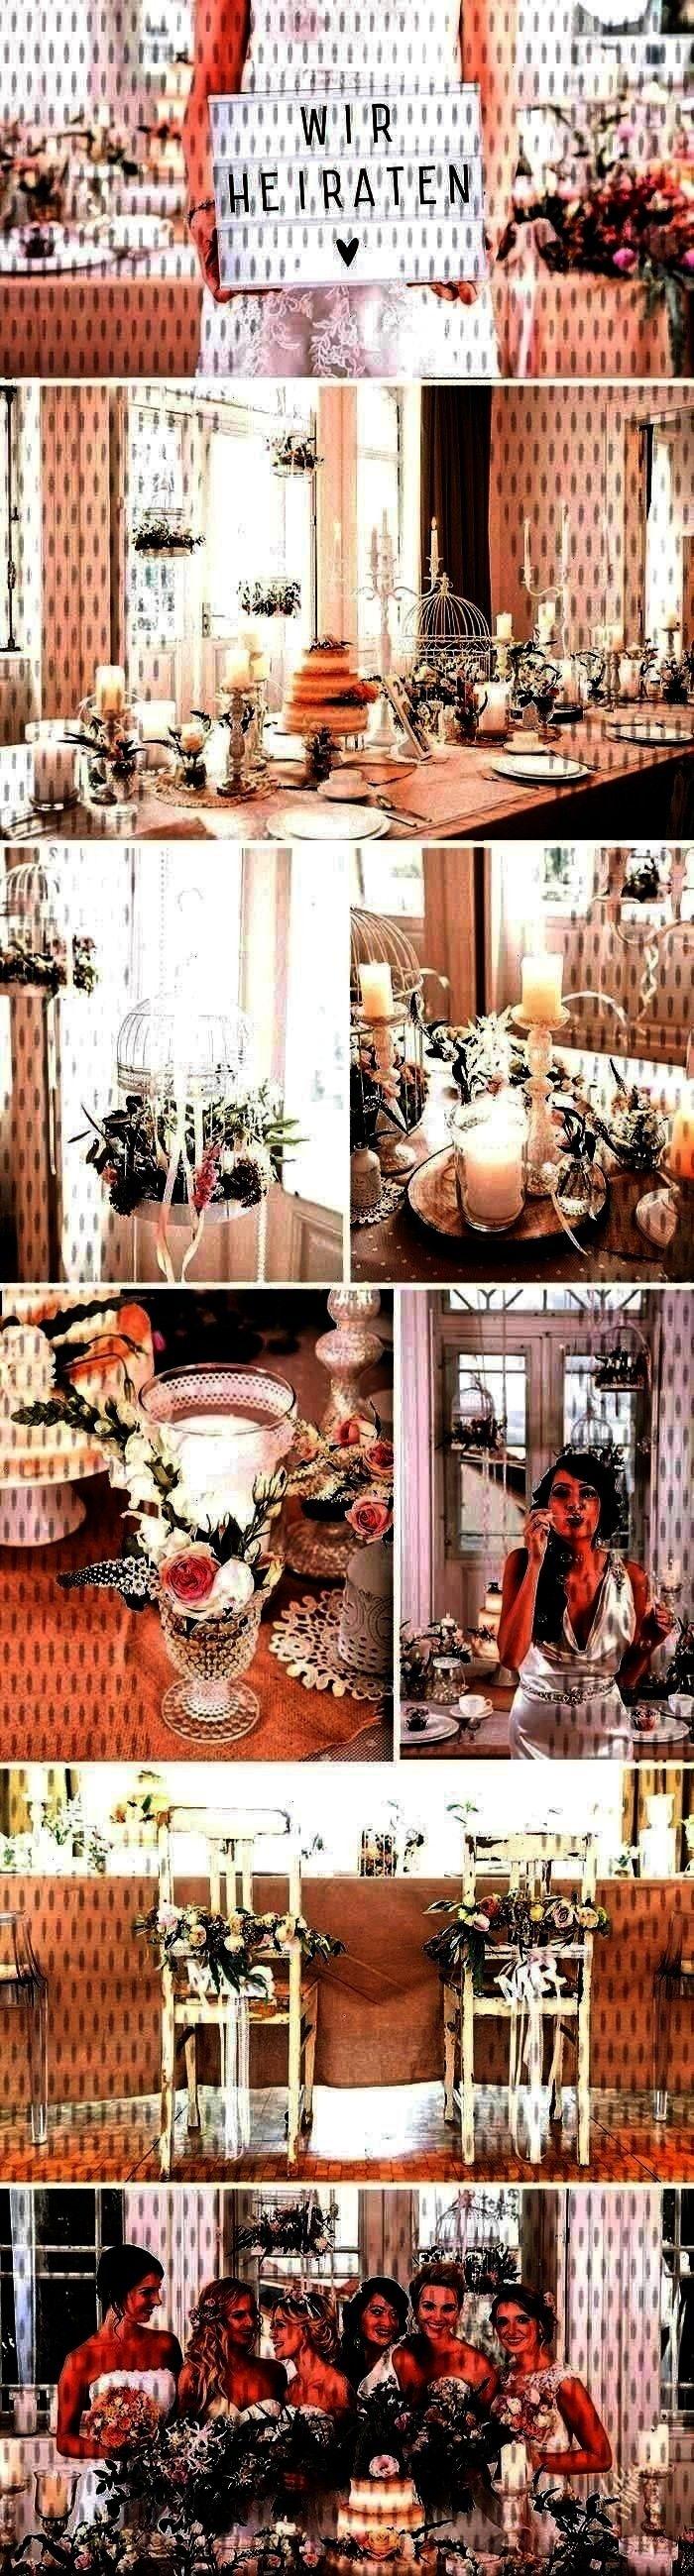 classic Style Wonderful Free of Charge Wedding CenterWonderful Free of Charge Wedding Centerpieces